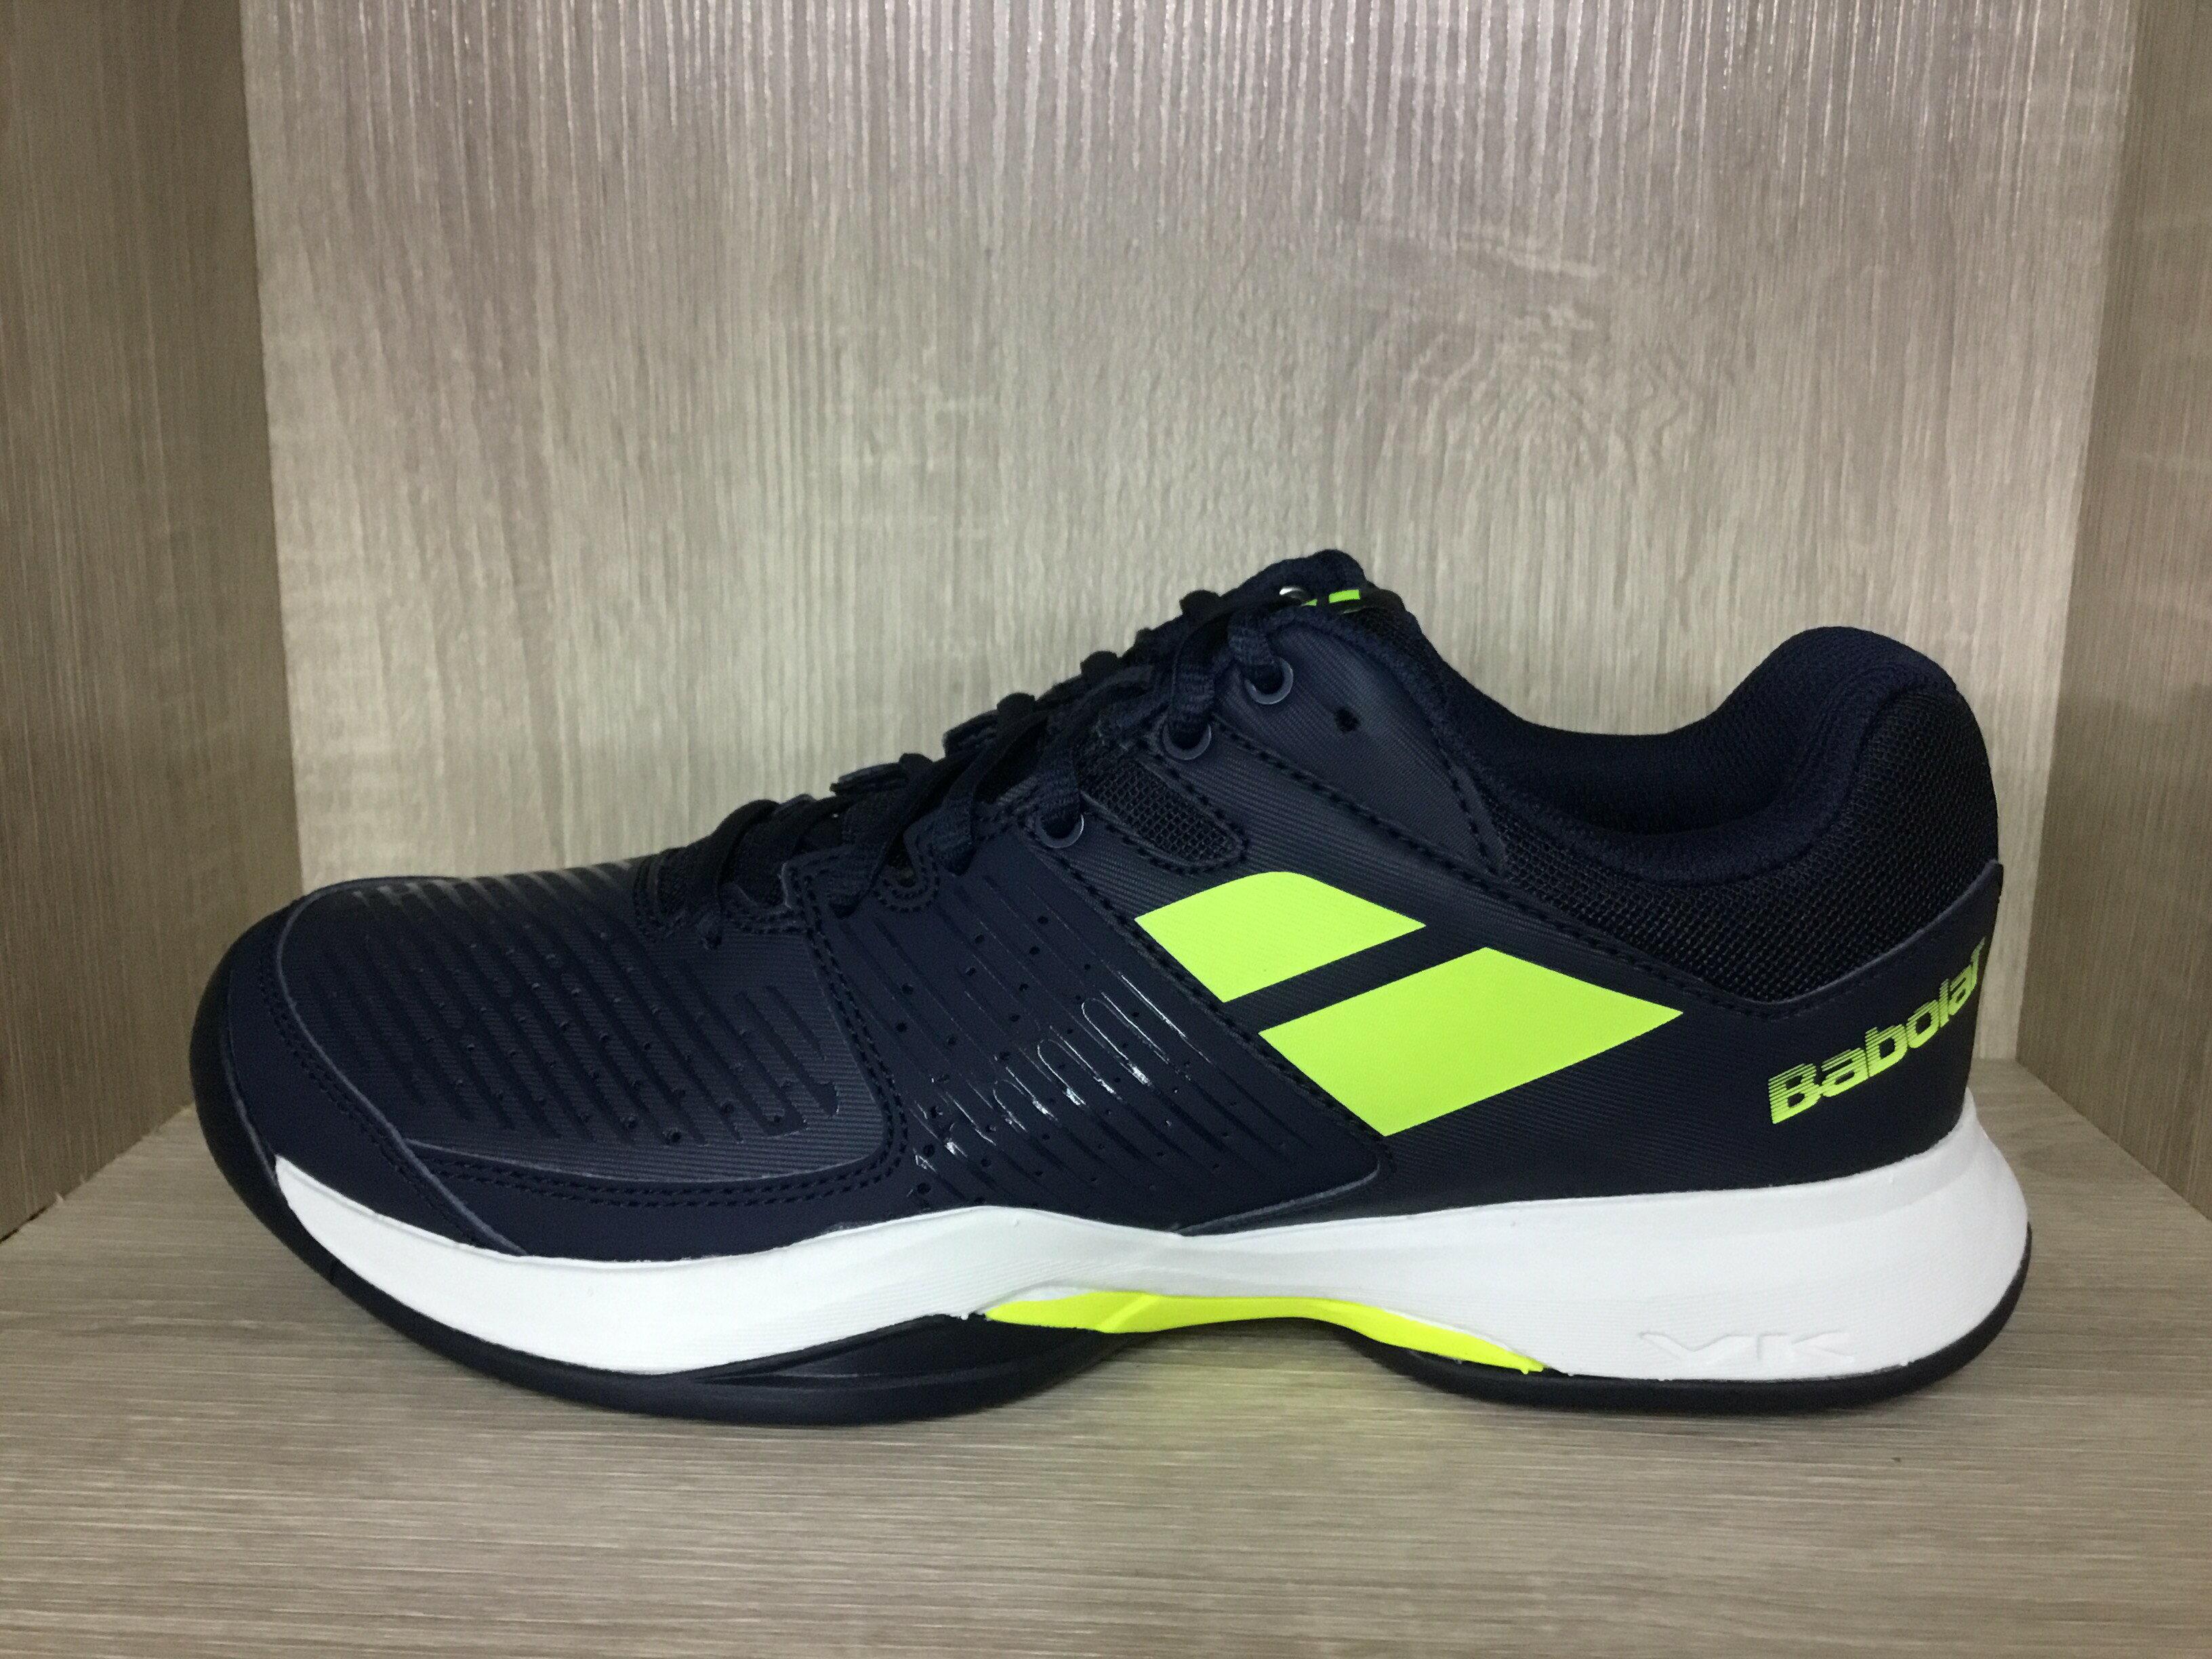 2017 Babolat Pulsion All Court Mens專業男網球鞋